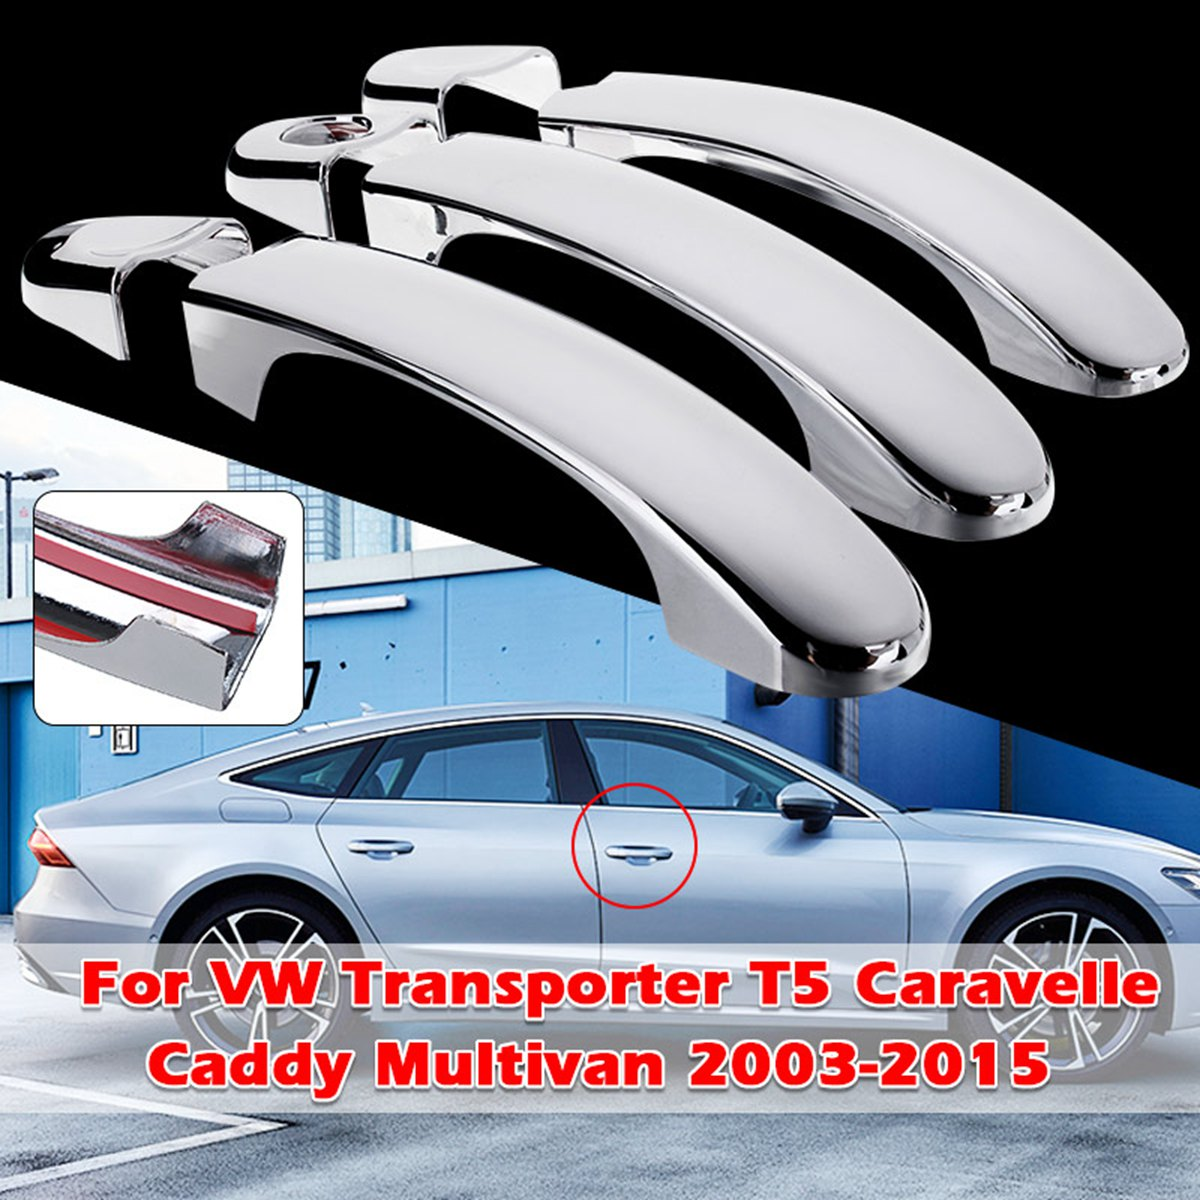 6x Chrome 3 Door Handle Cover Trim Set For VW Transporter T5 Caravelle Caddy Multivan 03-09